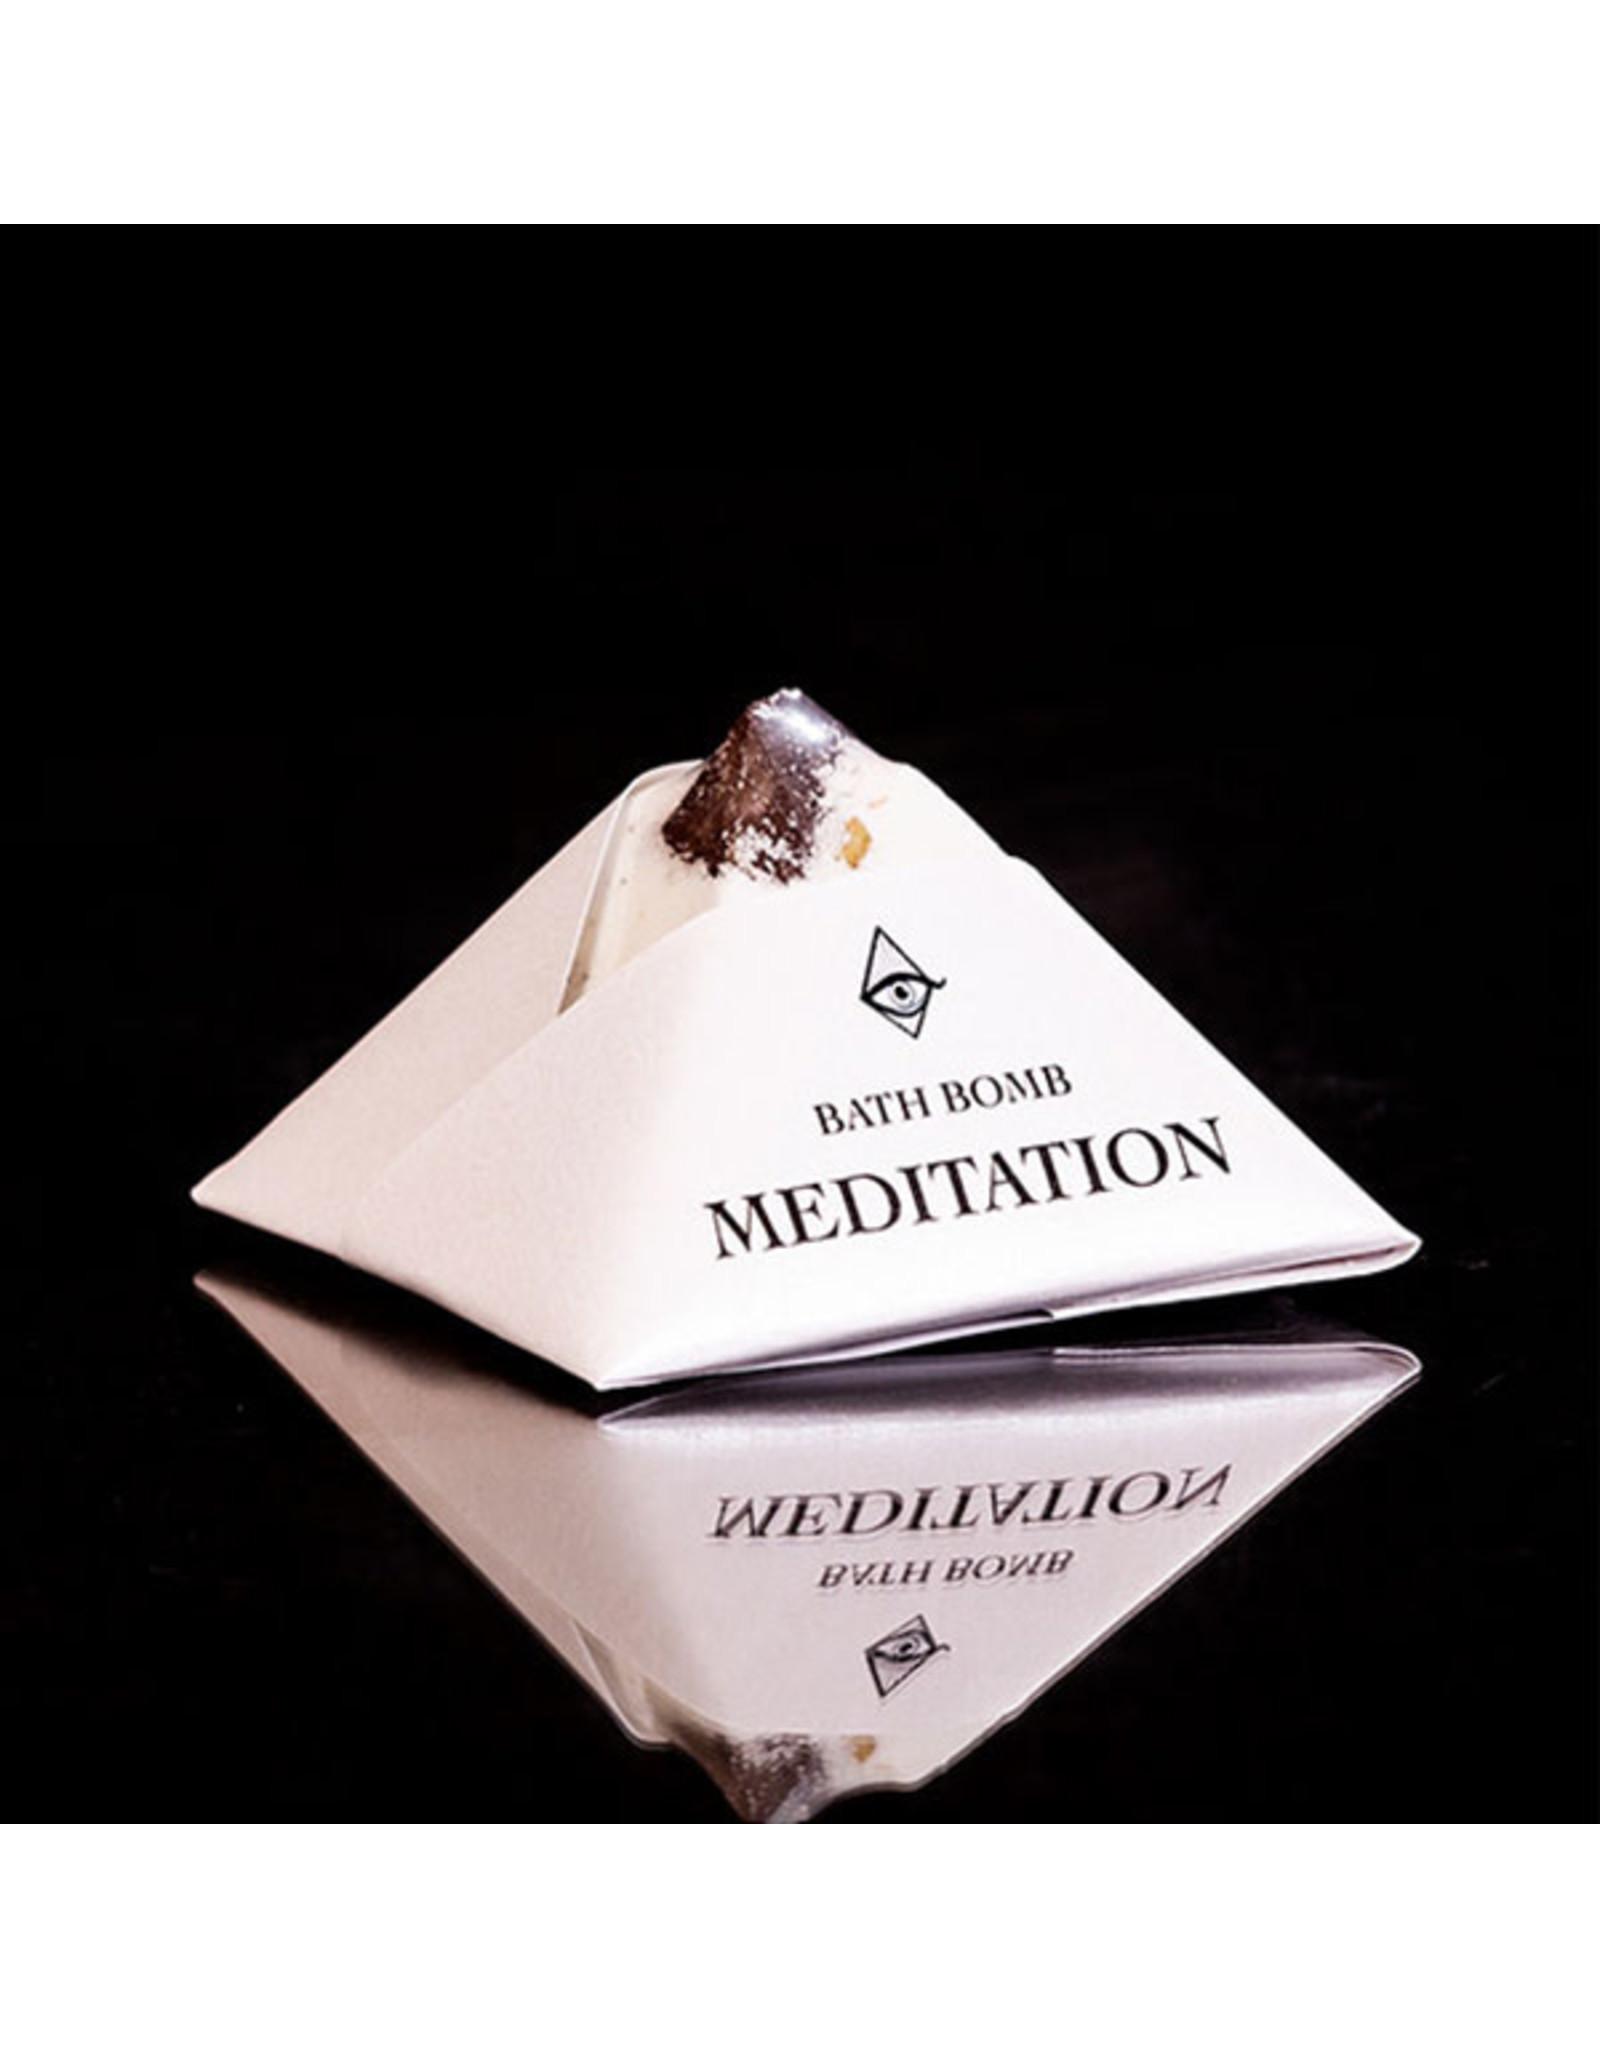 Meditation - Bath Bomb